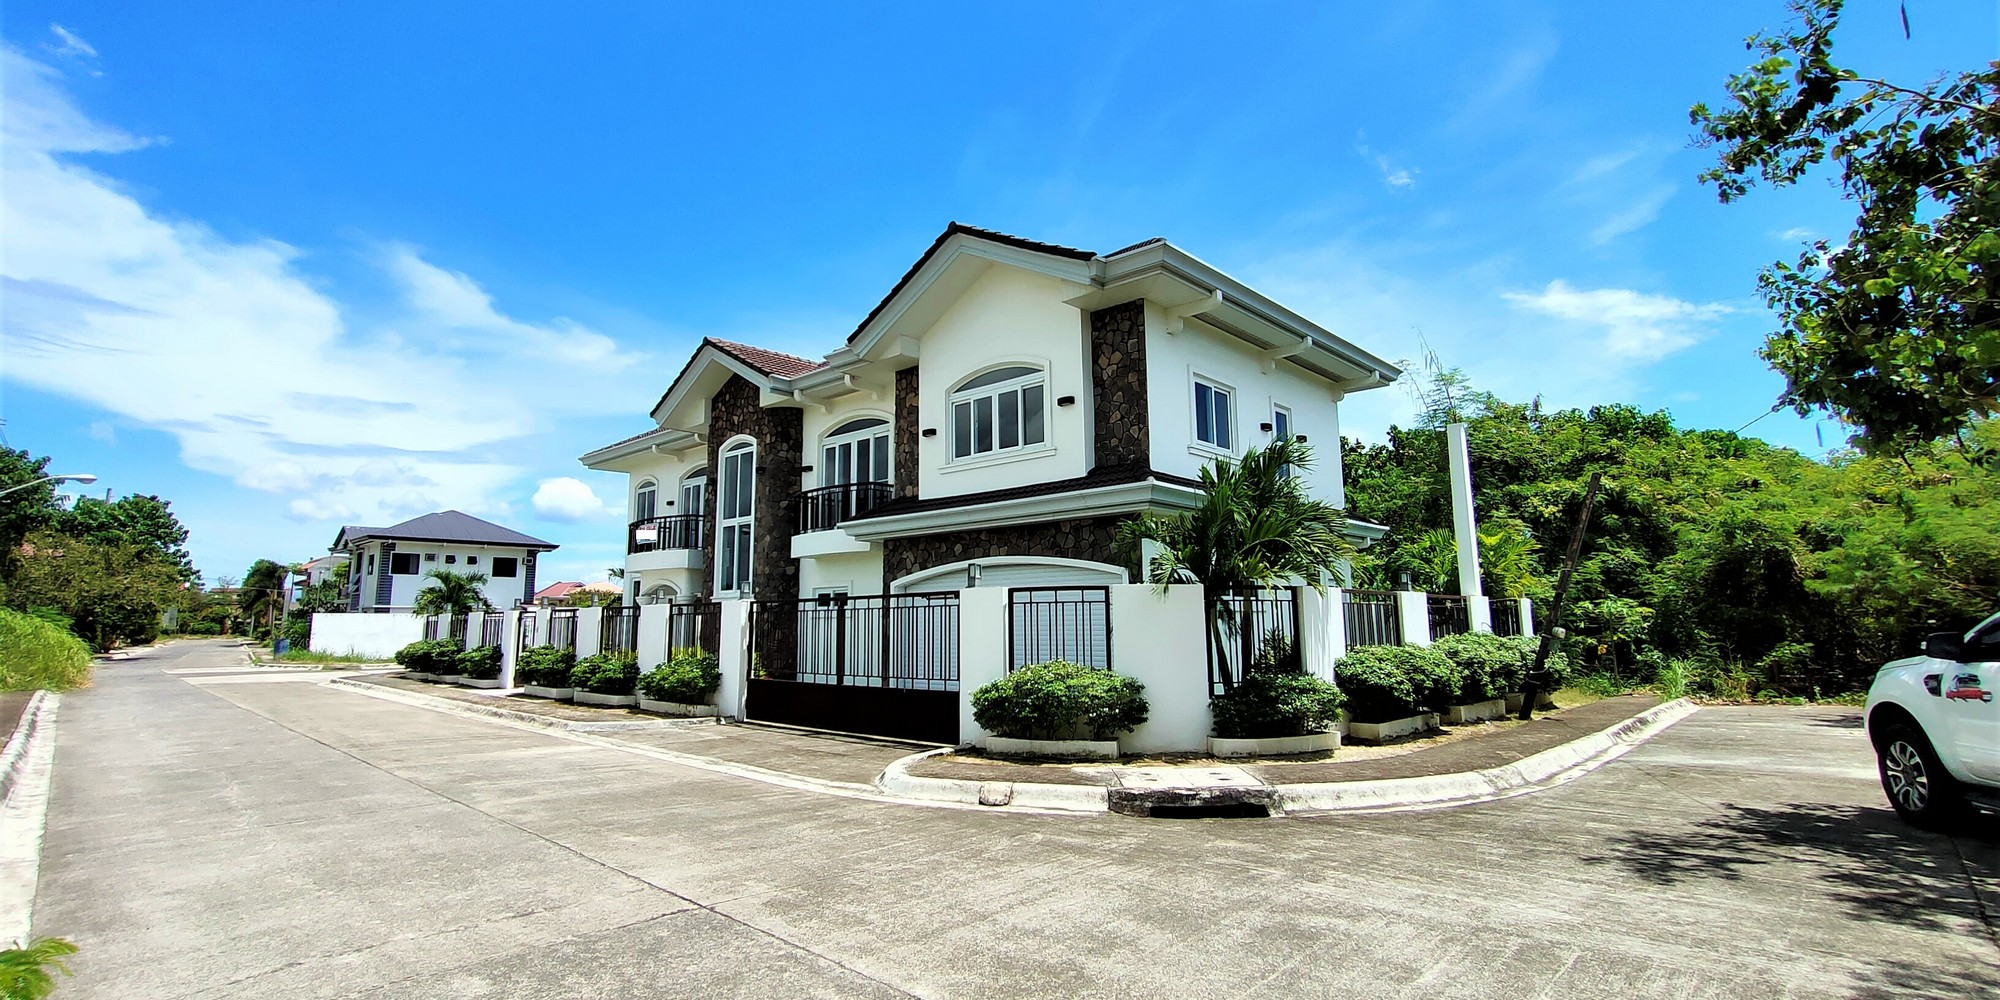 House for Sale in Corona del Mar Talisay Cebu Near The Beach